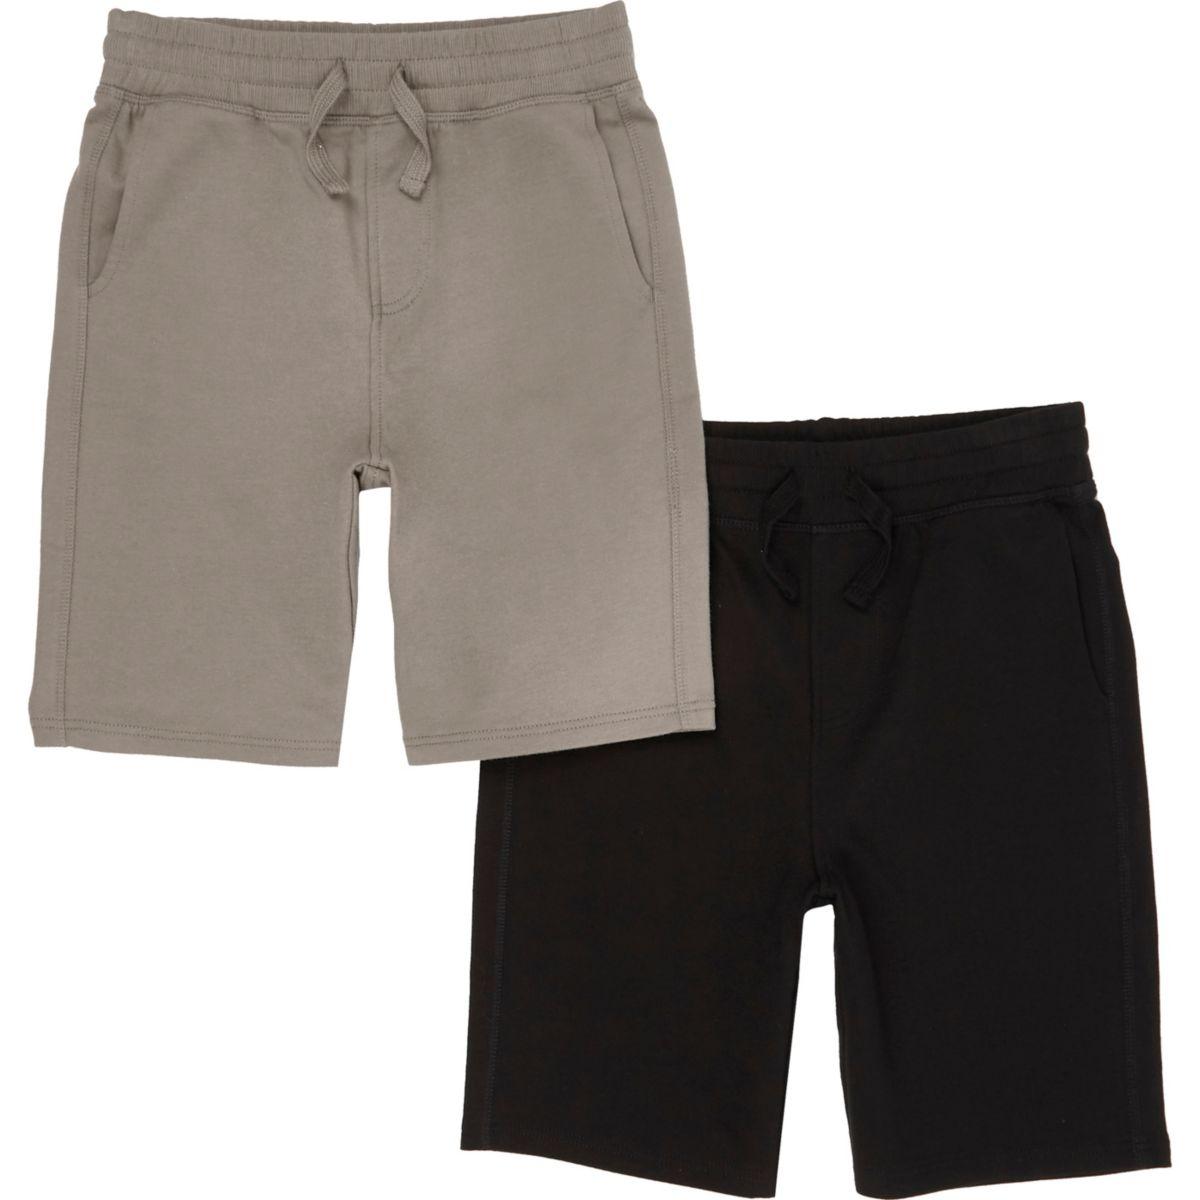 Boys black and khaki jersey shorts